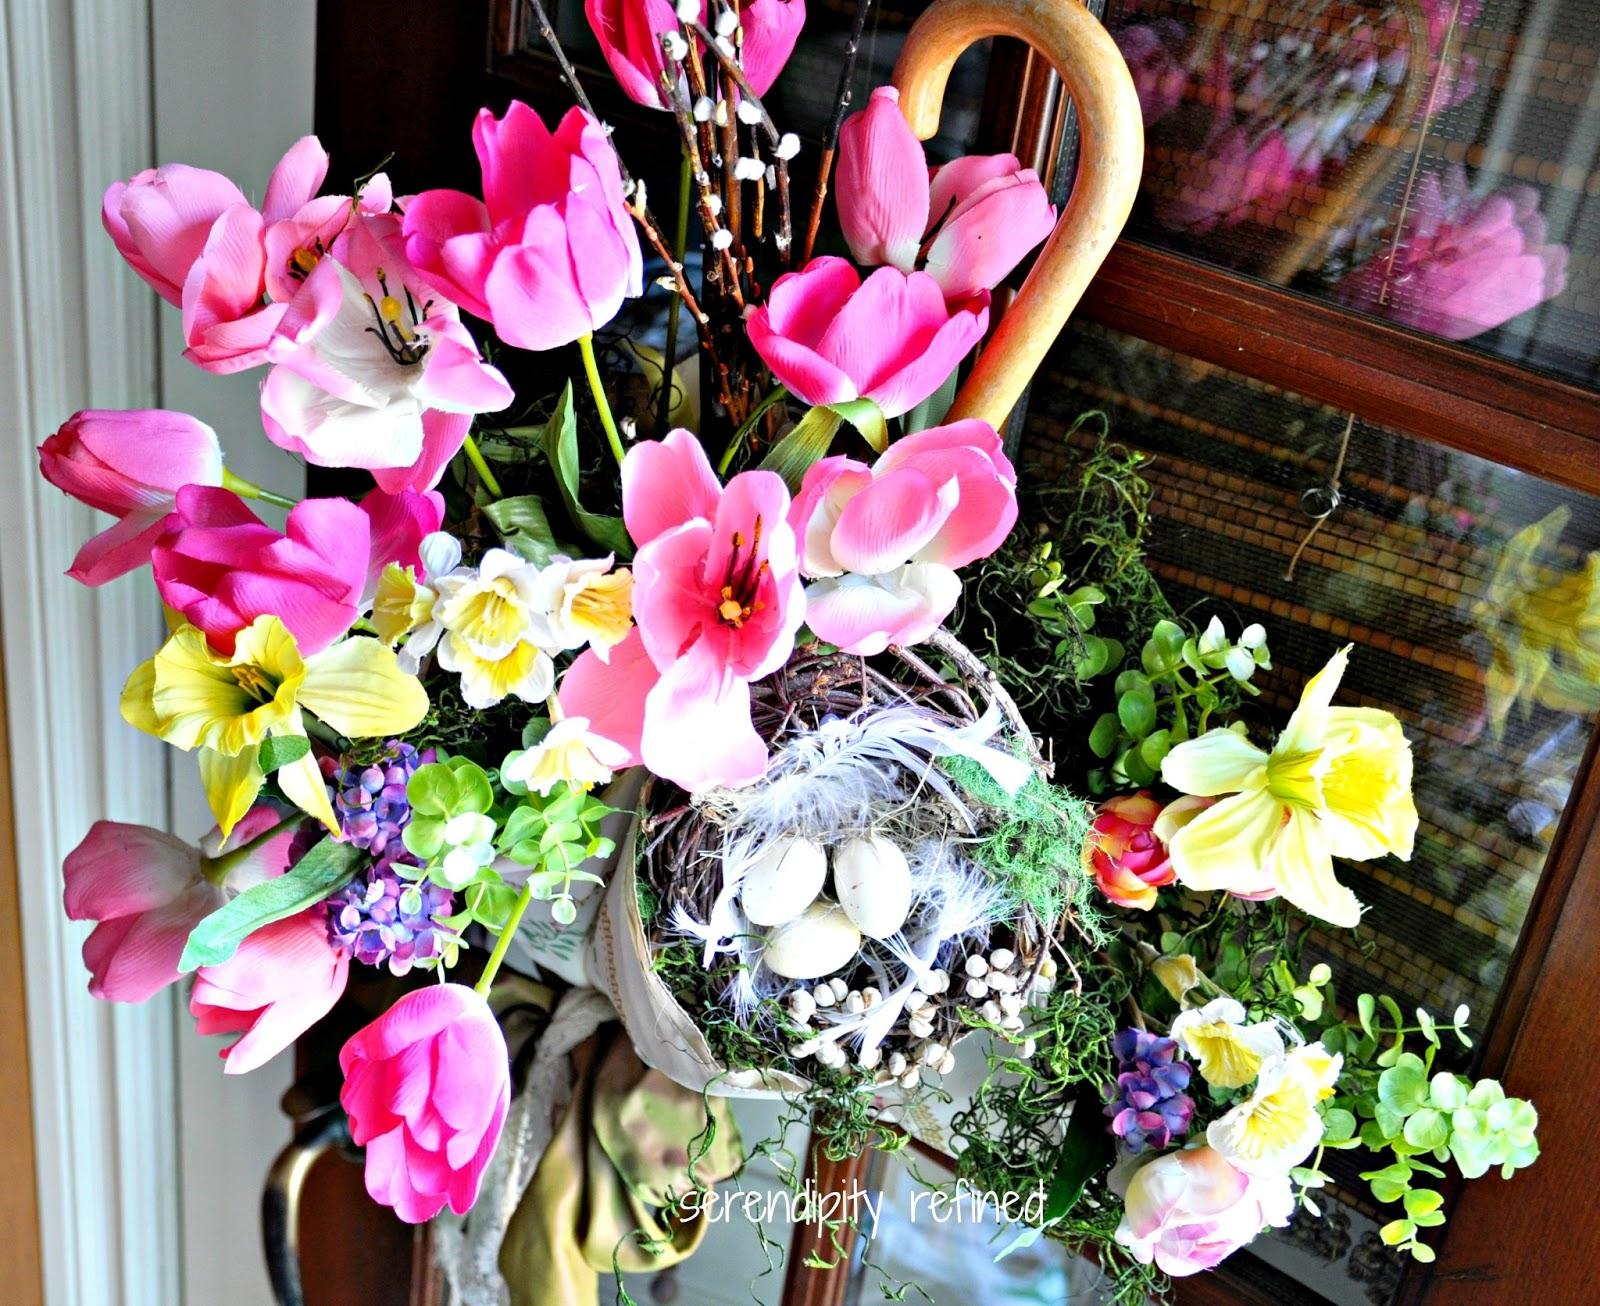 Serendipity Refined Blog Spring Side Door Decor April Showers